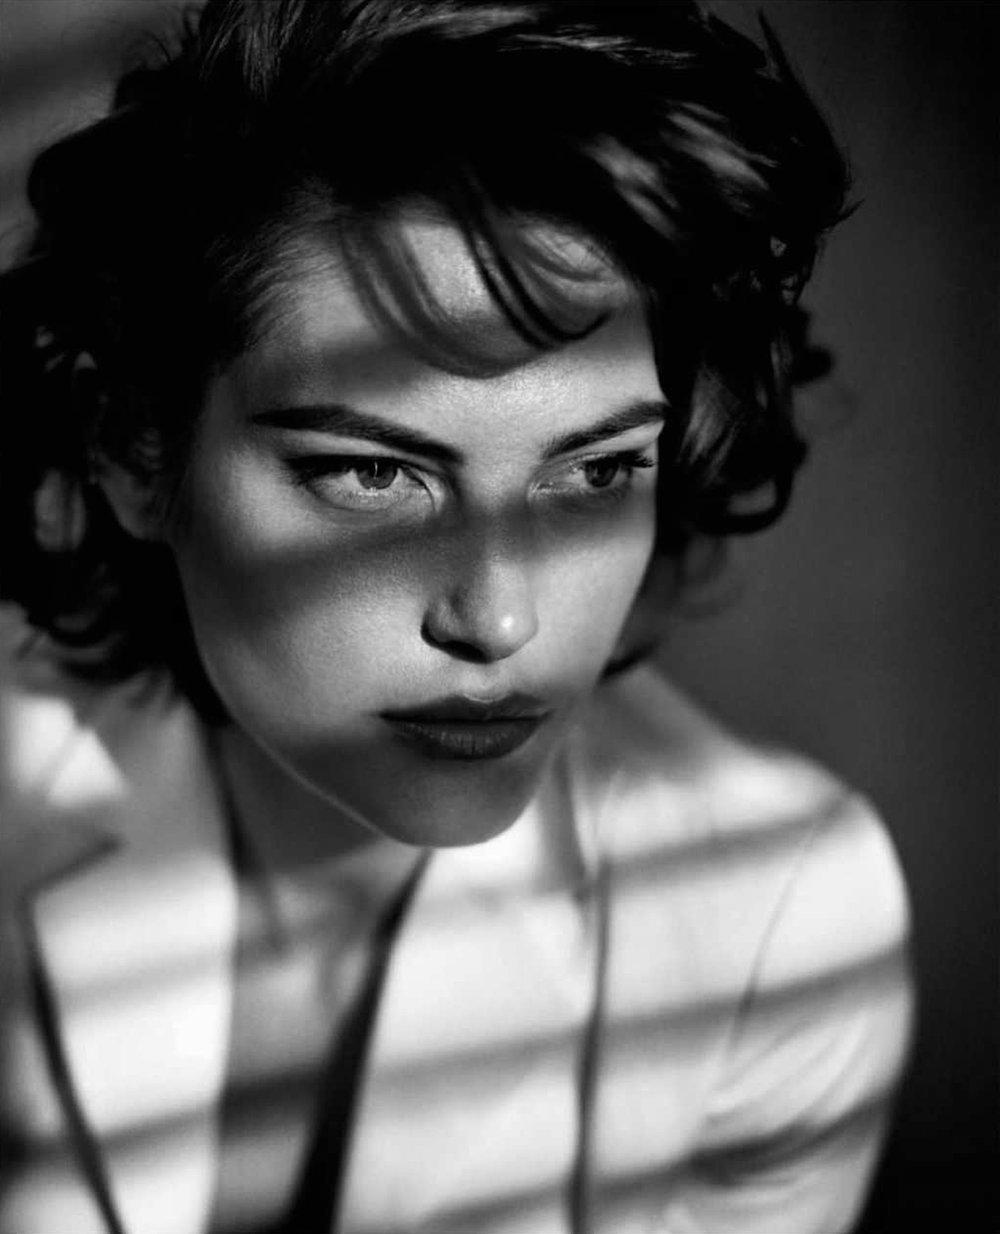 Catherine-McNeil-Vincent-Peters-Harper's-Bazaar-Spain-  (2).jpg